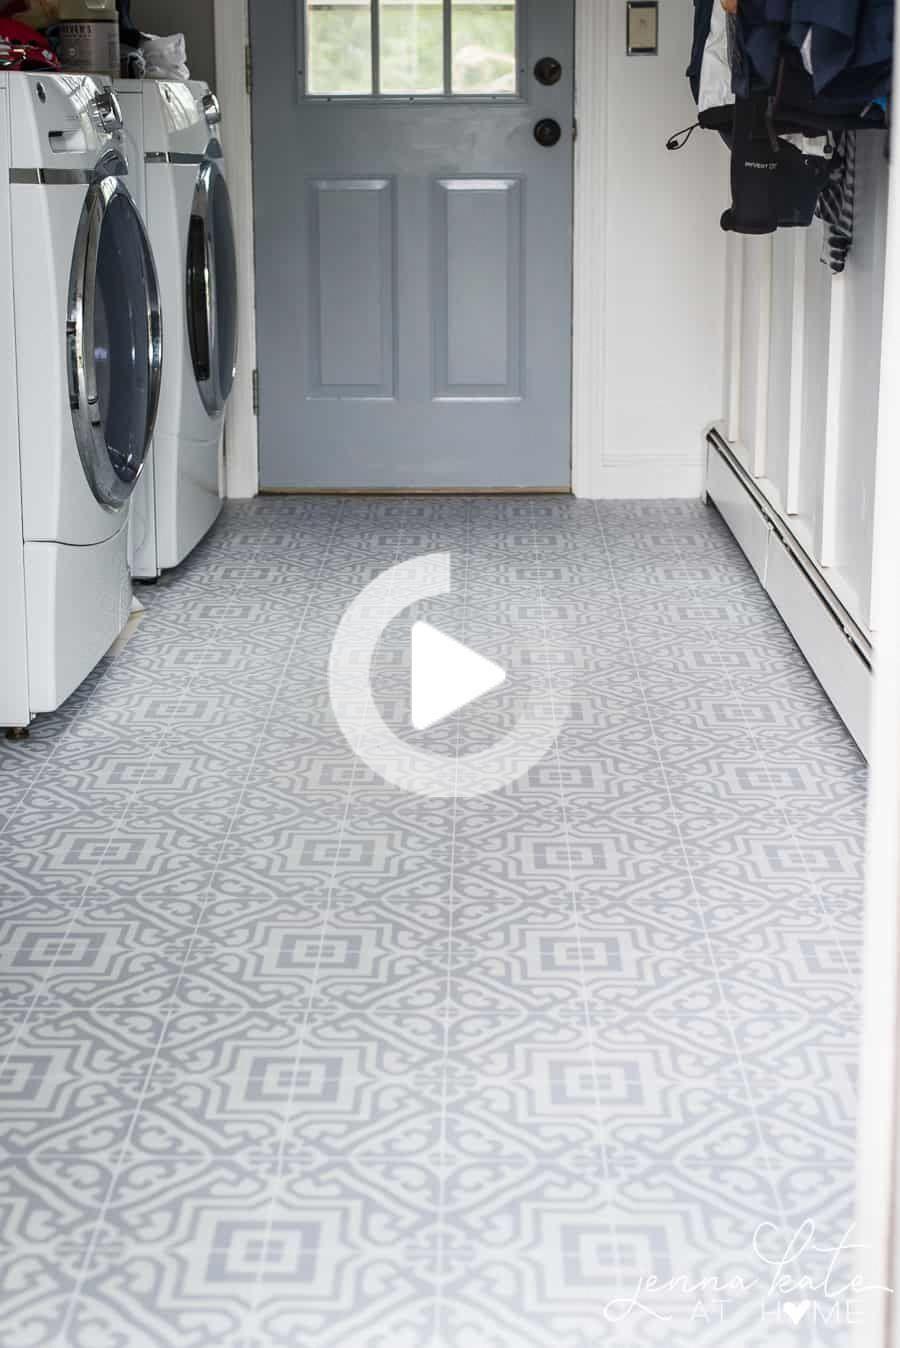 Polierter Betonboden Carrcrete Infinityfloor Polierter Beton Kuche Geschliffener Beton Beton Kuchenboden